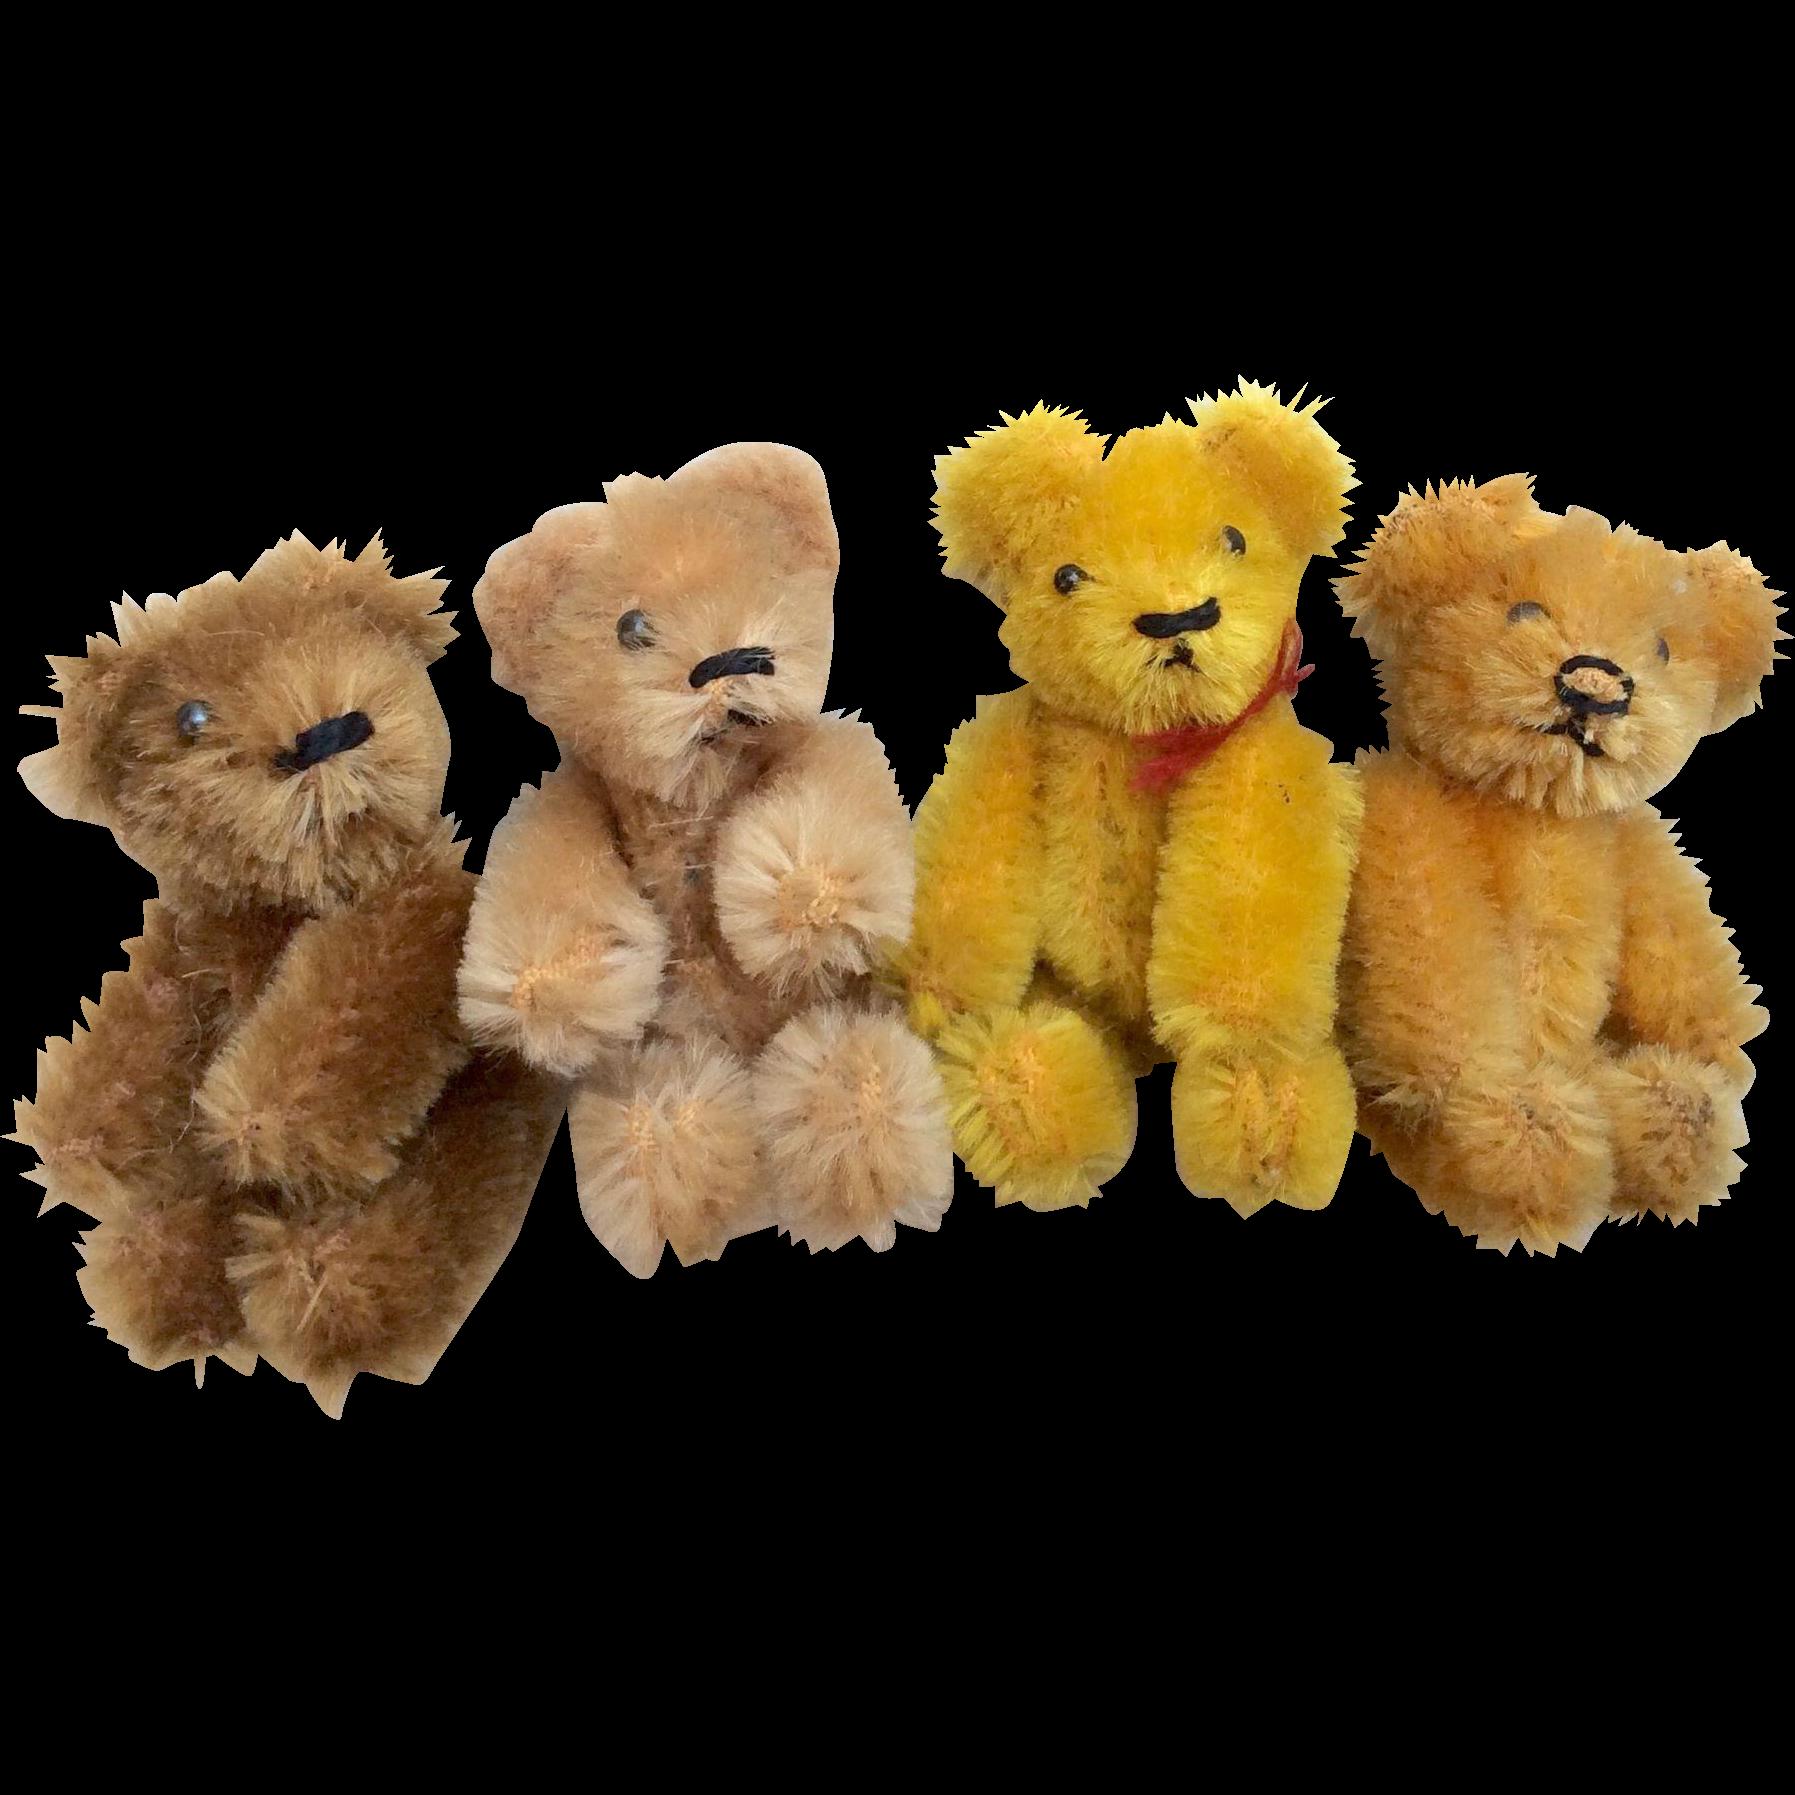 4 German Schuco Miniature 2 75 Teddy Bear For Doll Or Dollhouse Teddy Teddy Bear Antique Teddy Bears